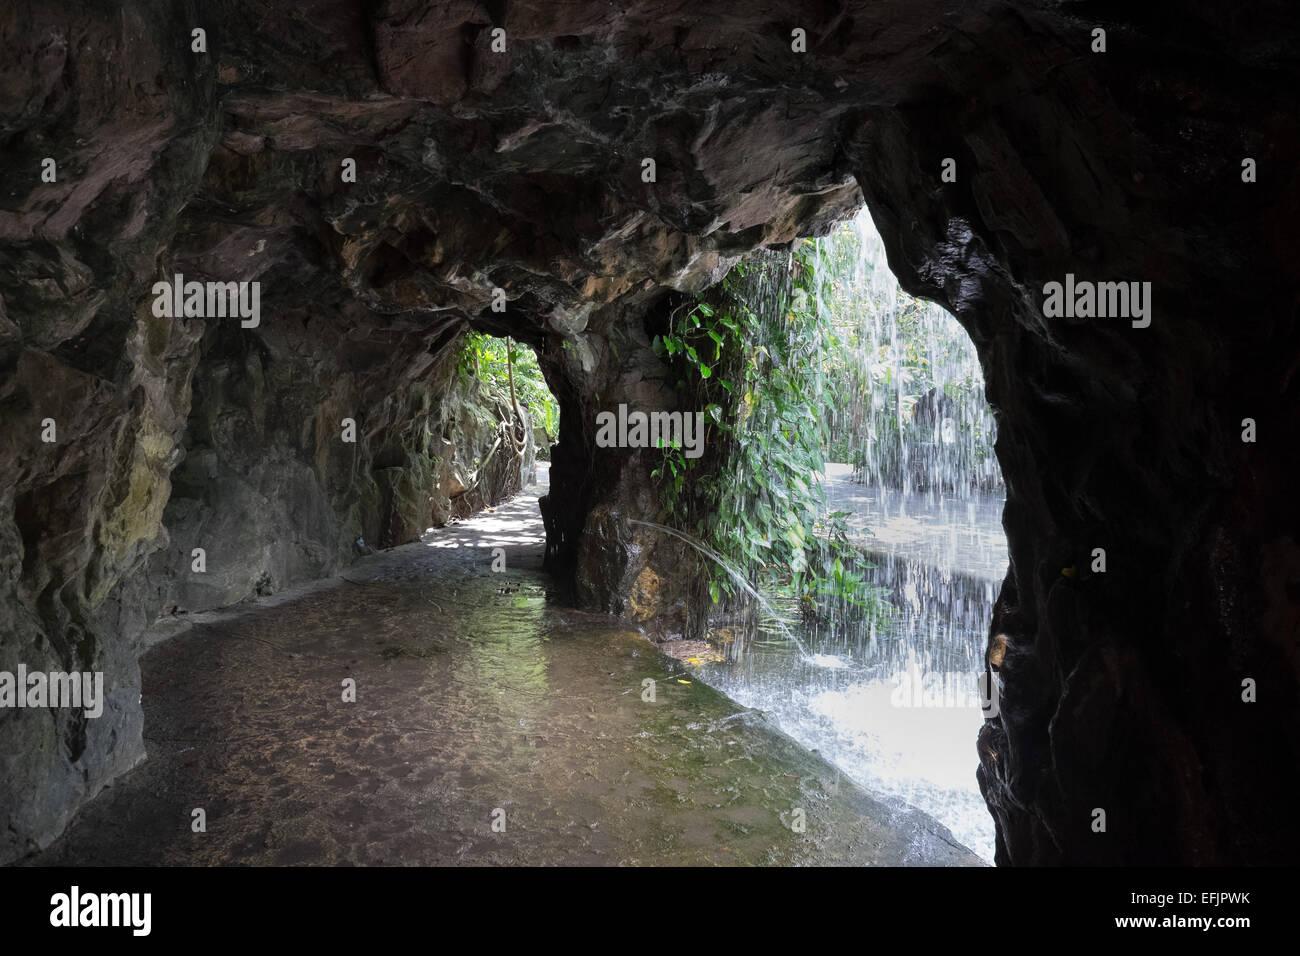 Singapore Botanic Gardens Man Made Waterfall And Cave